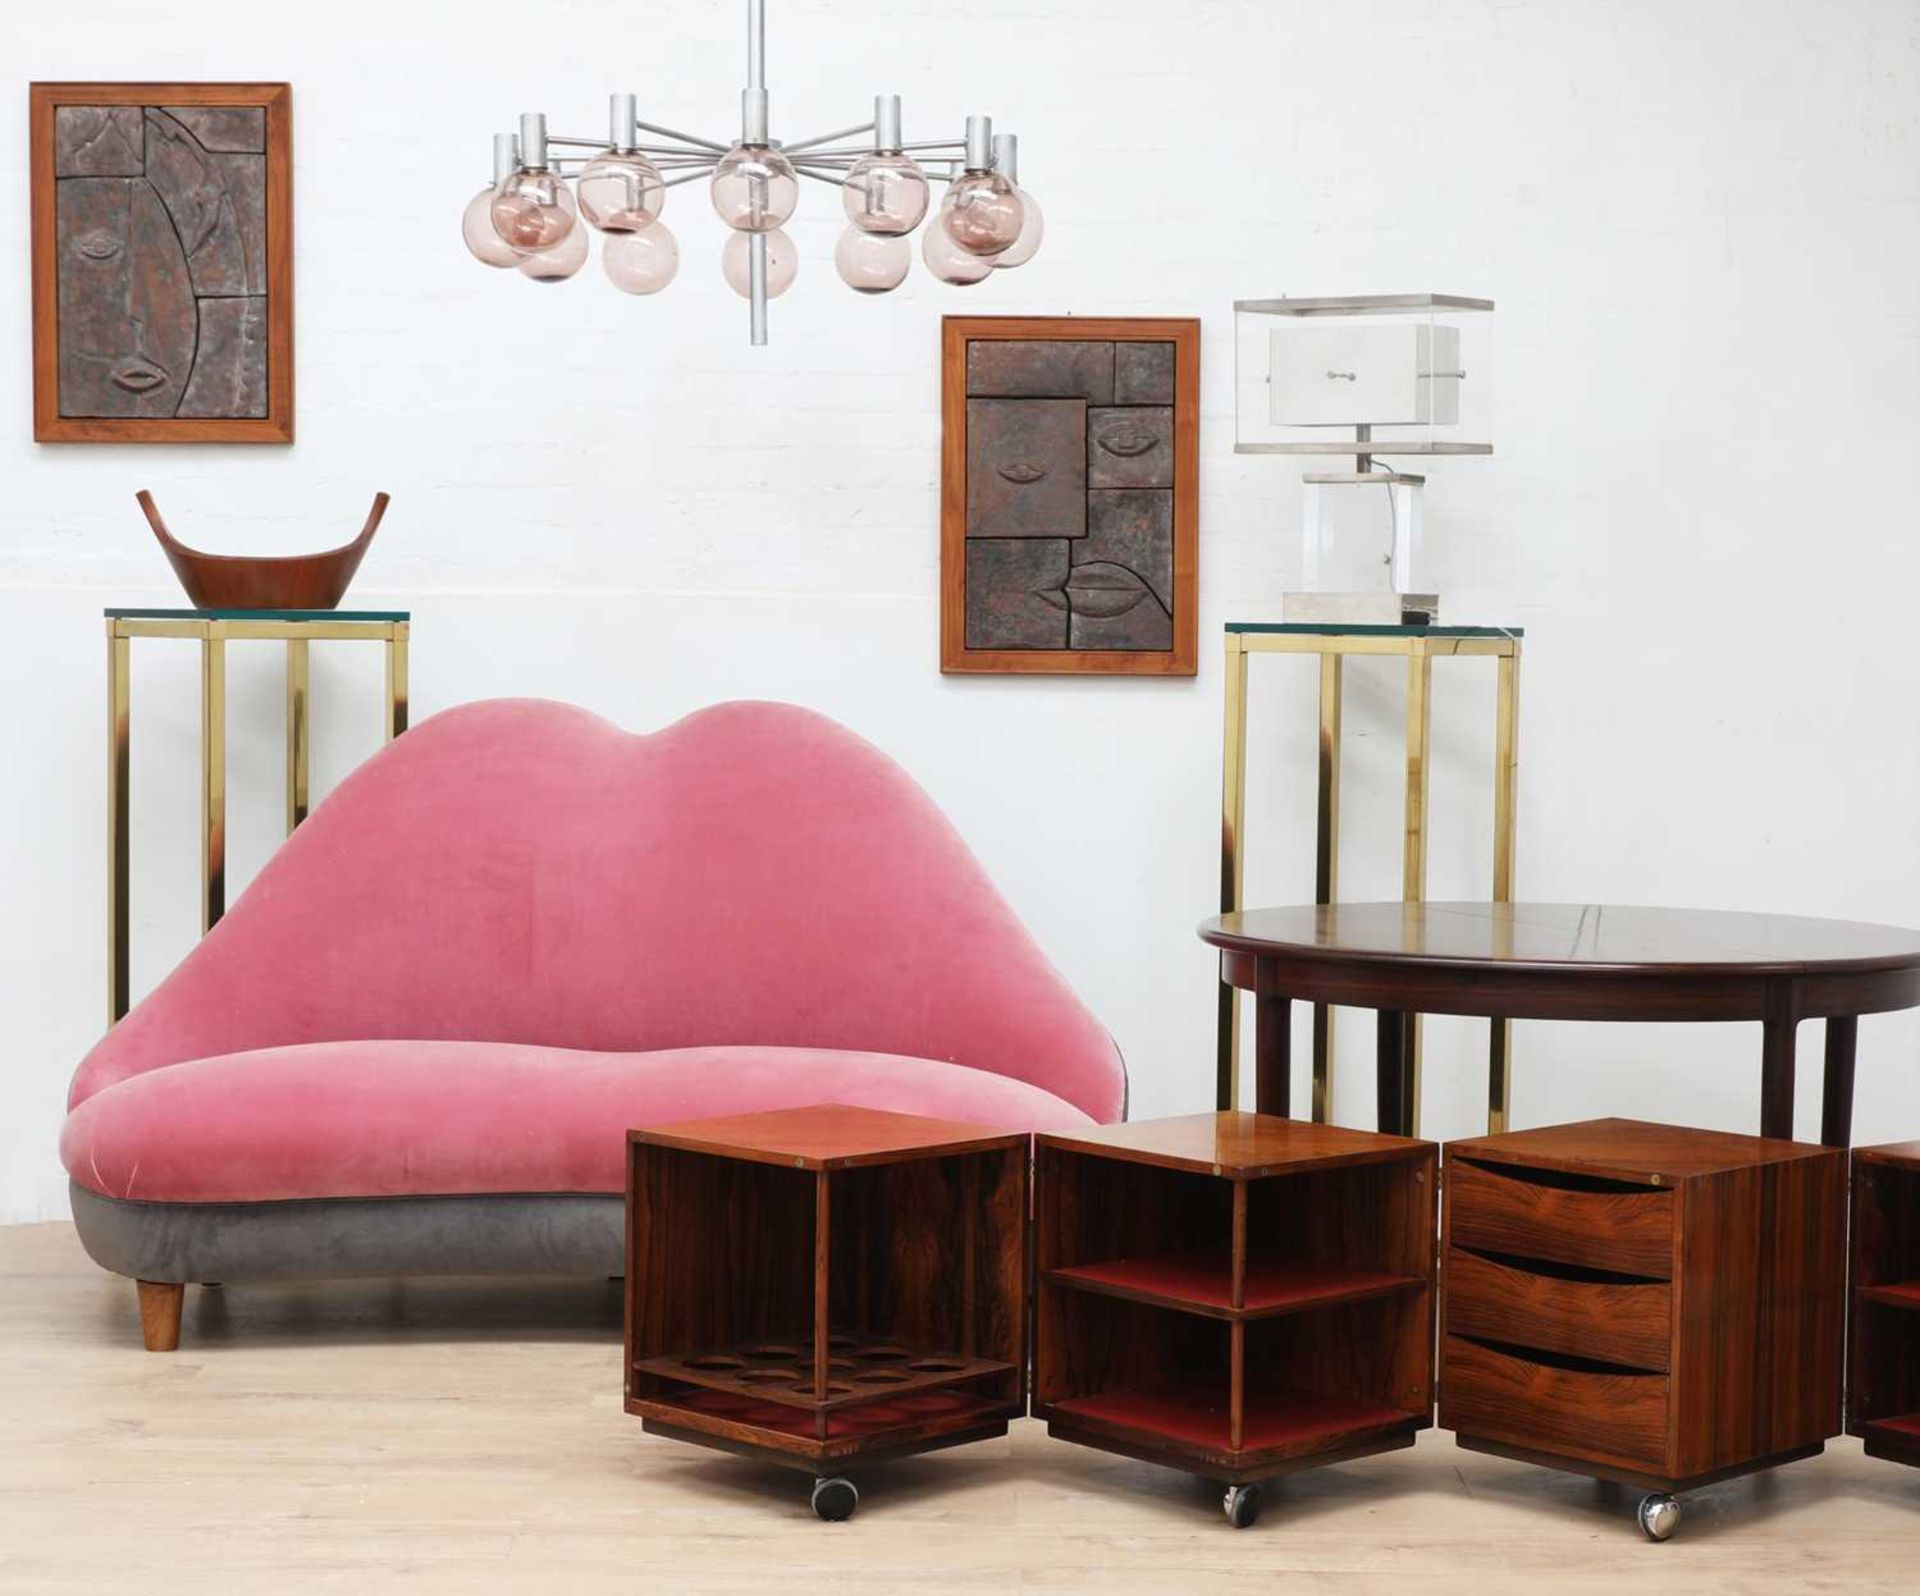 An Italian 'lips' shaped sofa,